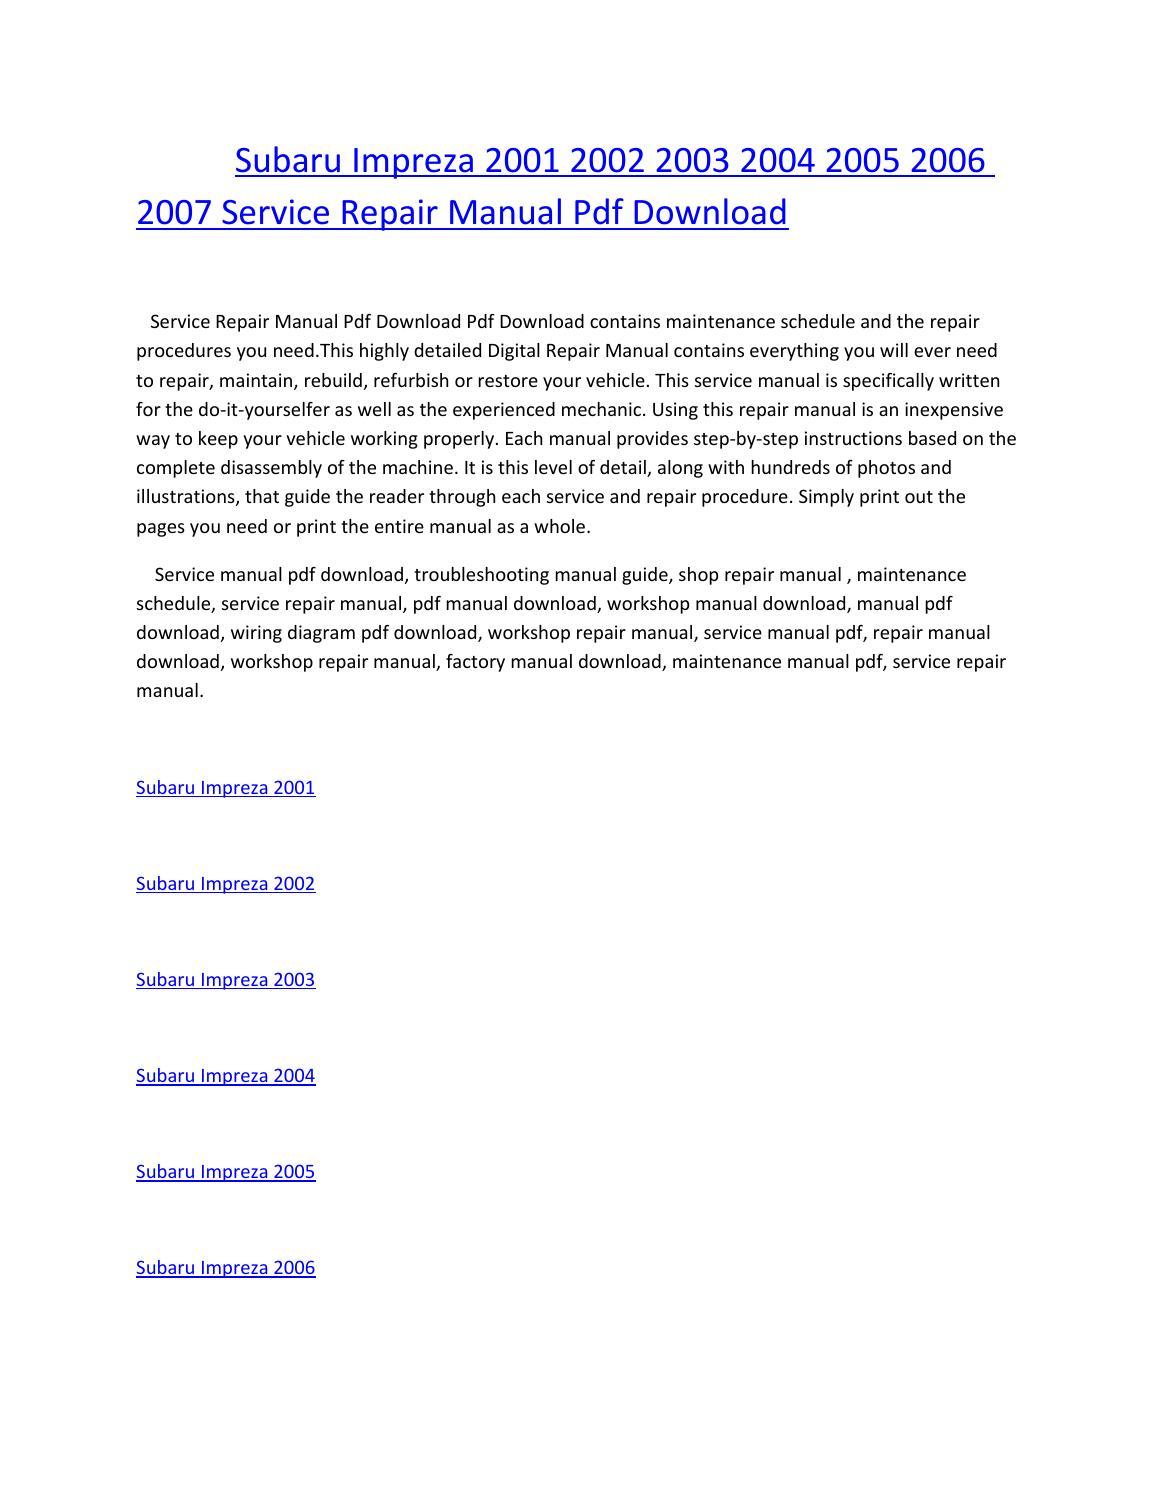 Subaru Impreza 2001 2002 2003 2004 2005 2006 2007 Service Repair Wiring Diagram Manual Pdf Download By Amurgului Issuu